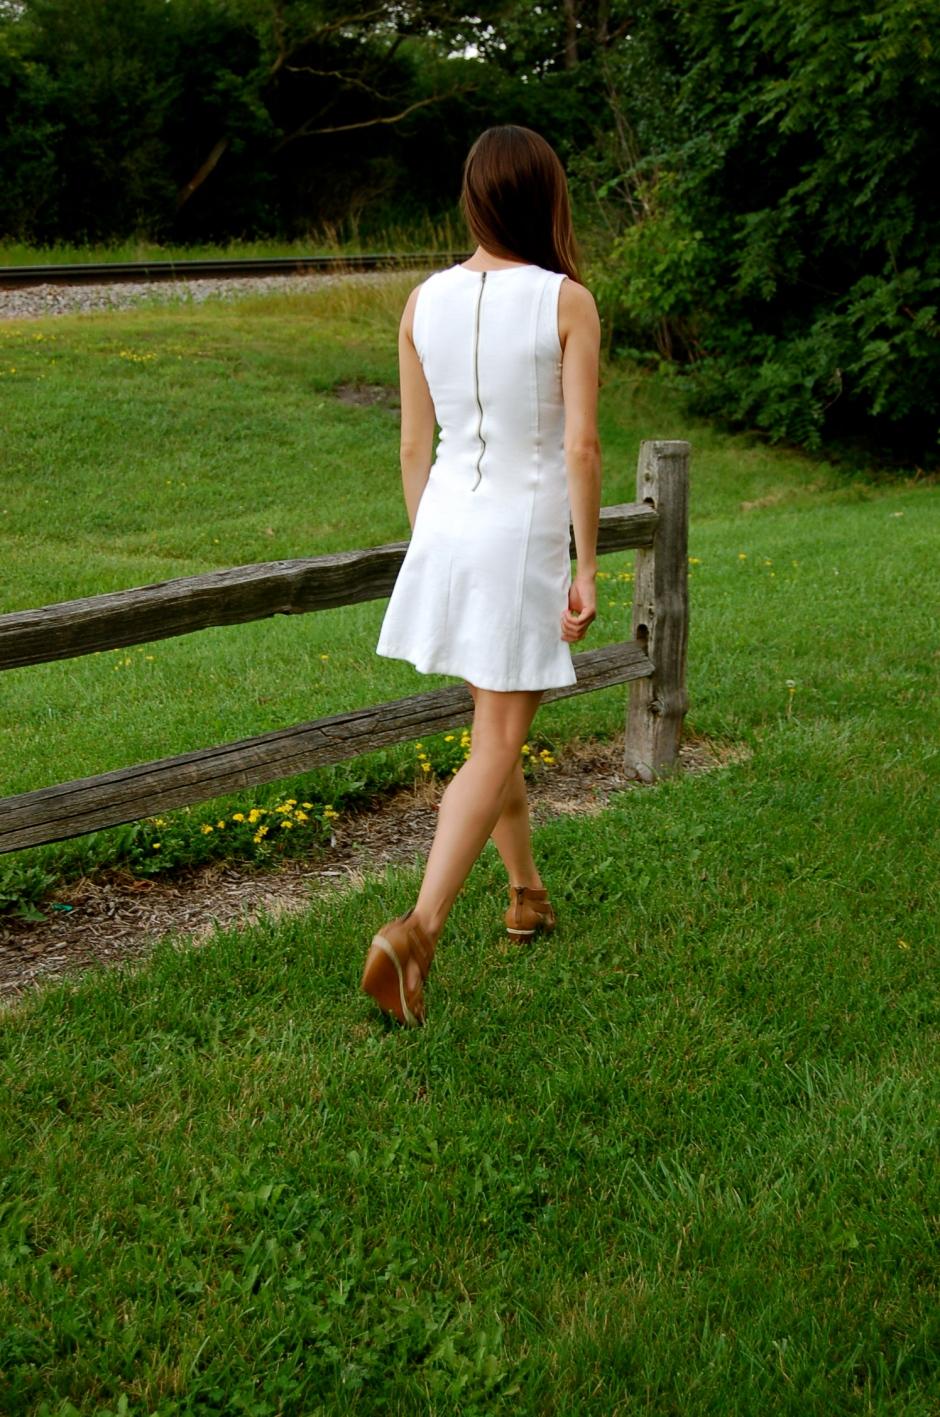 j.crew white dress, little white dress, simple little white dress, fit and flare dress